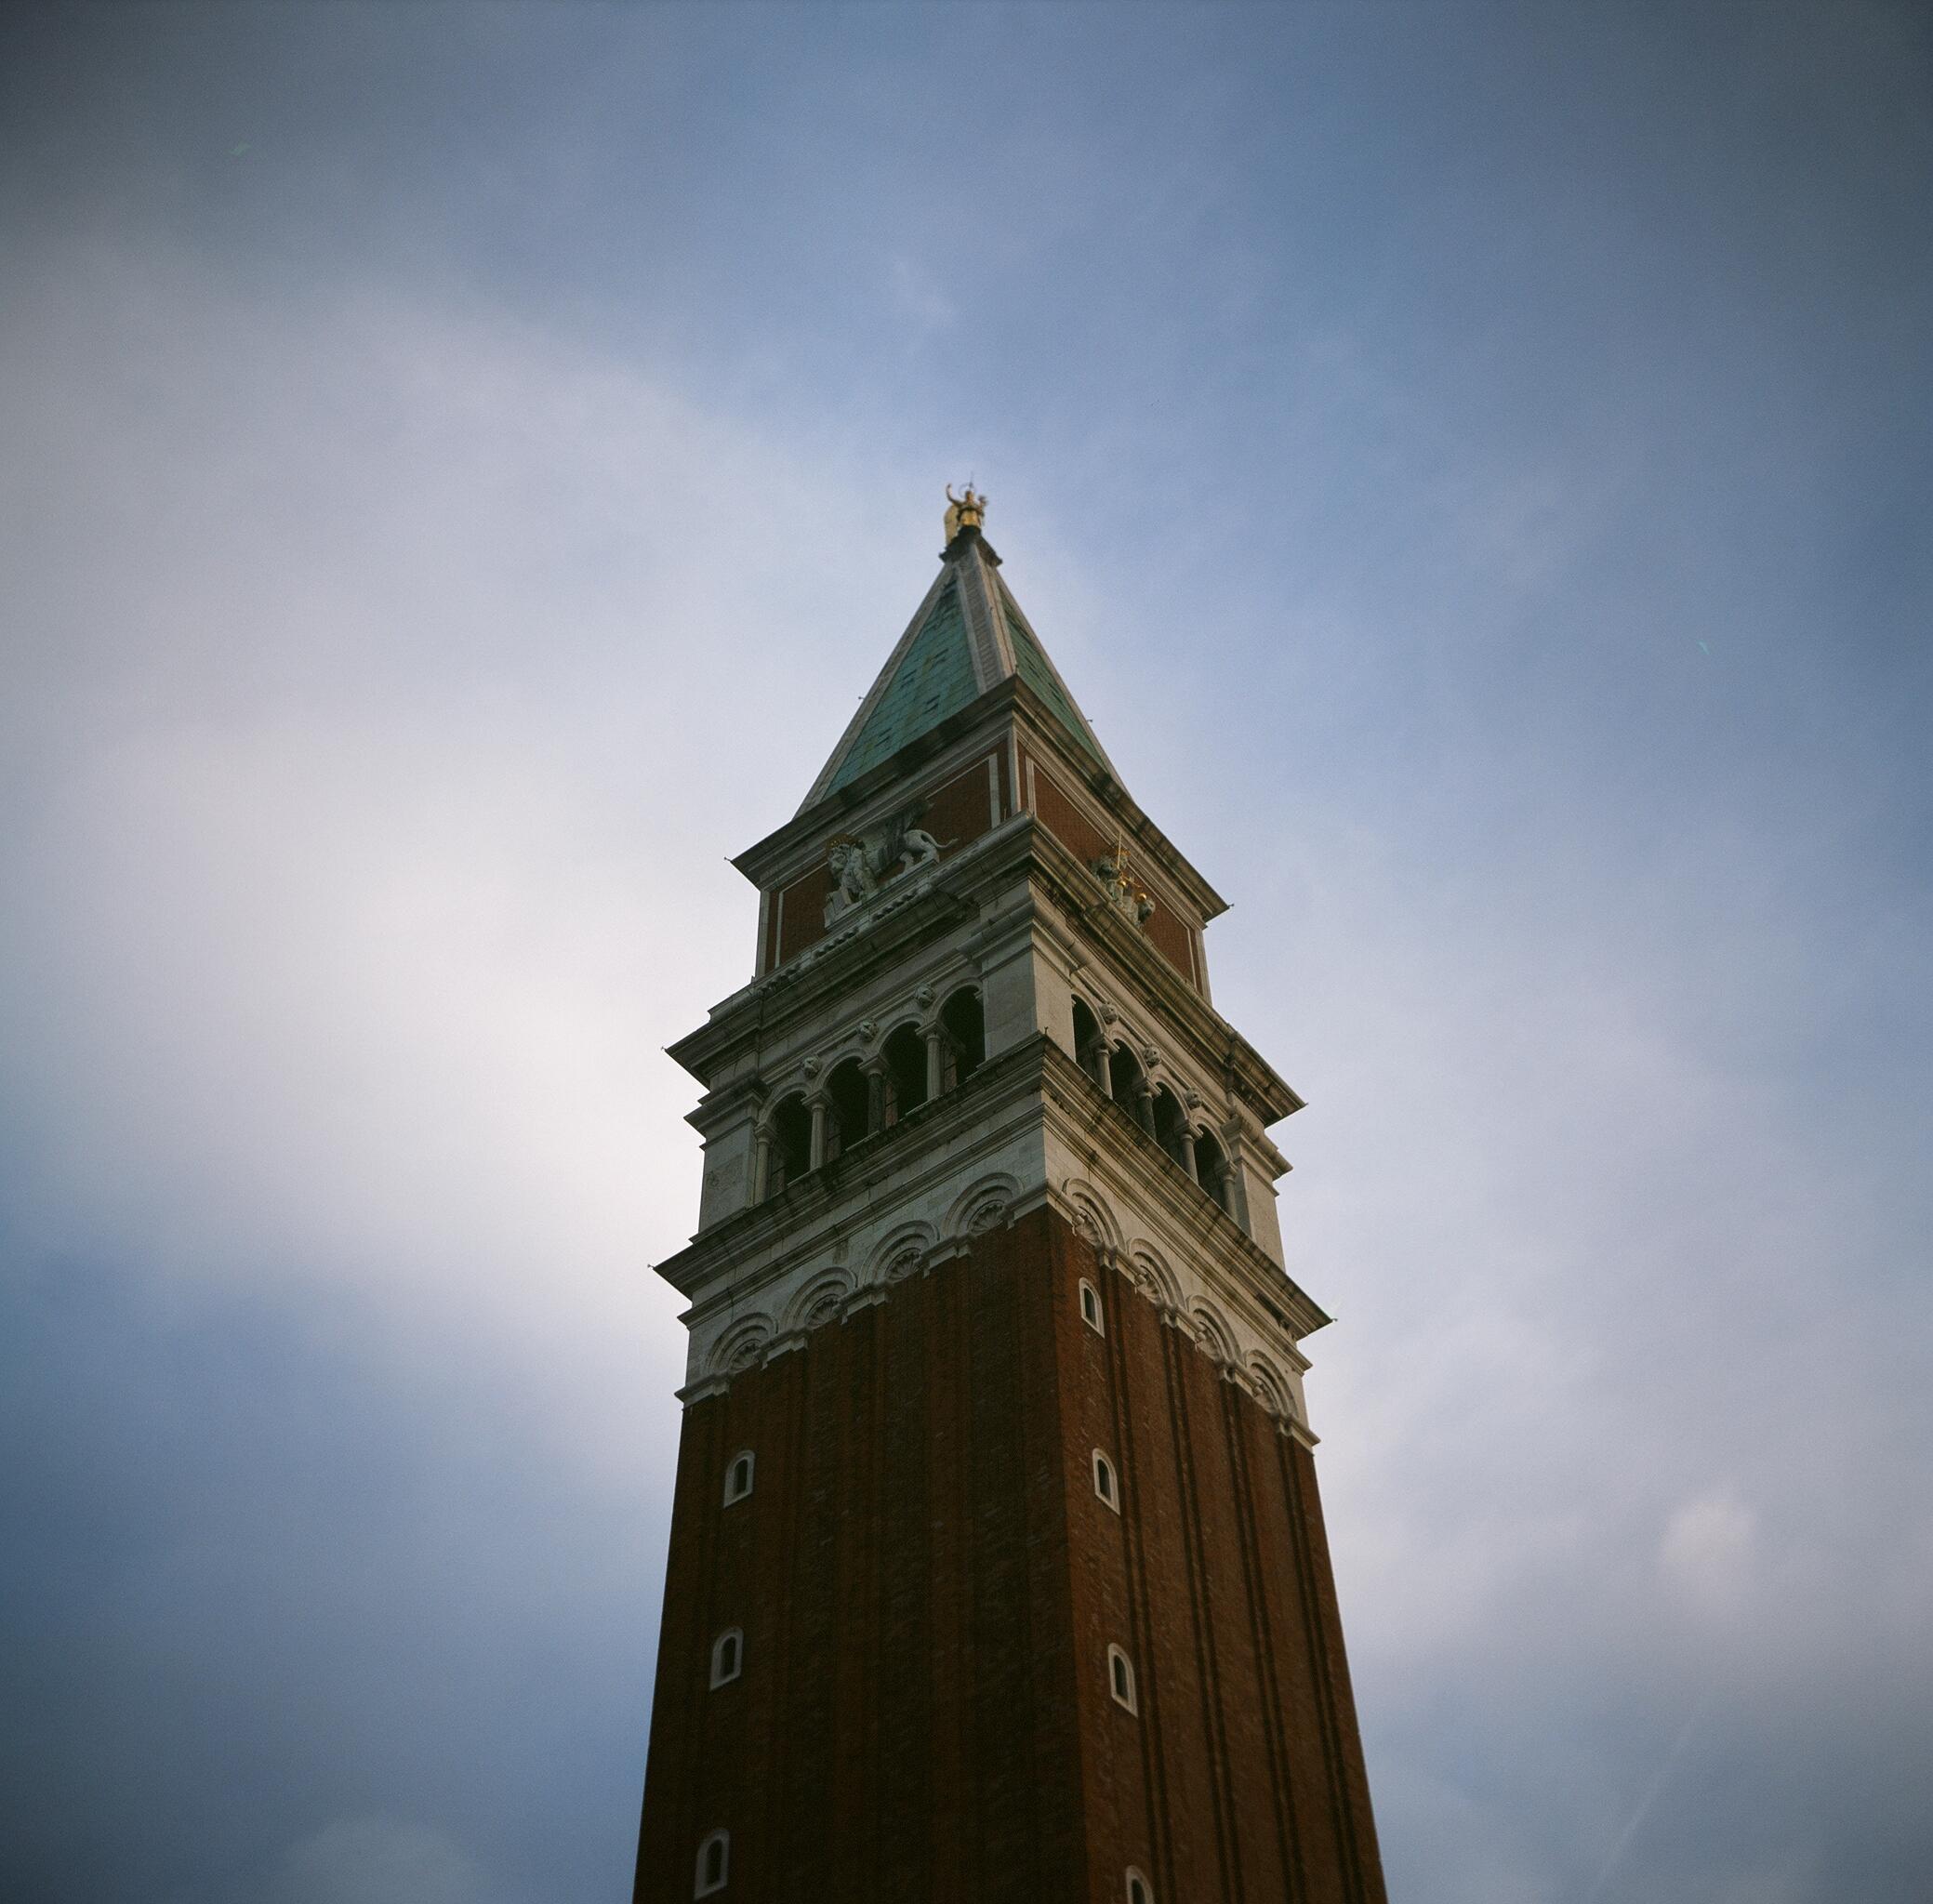 Campanile in San Marco